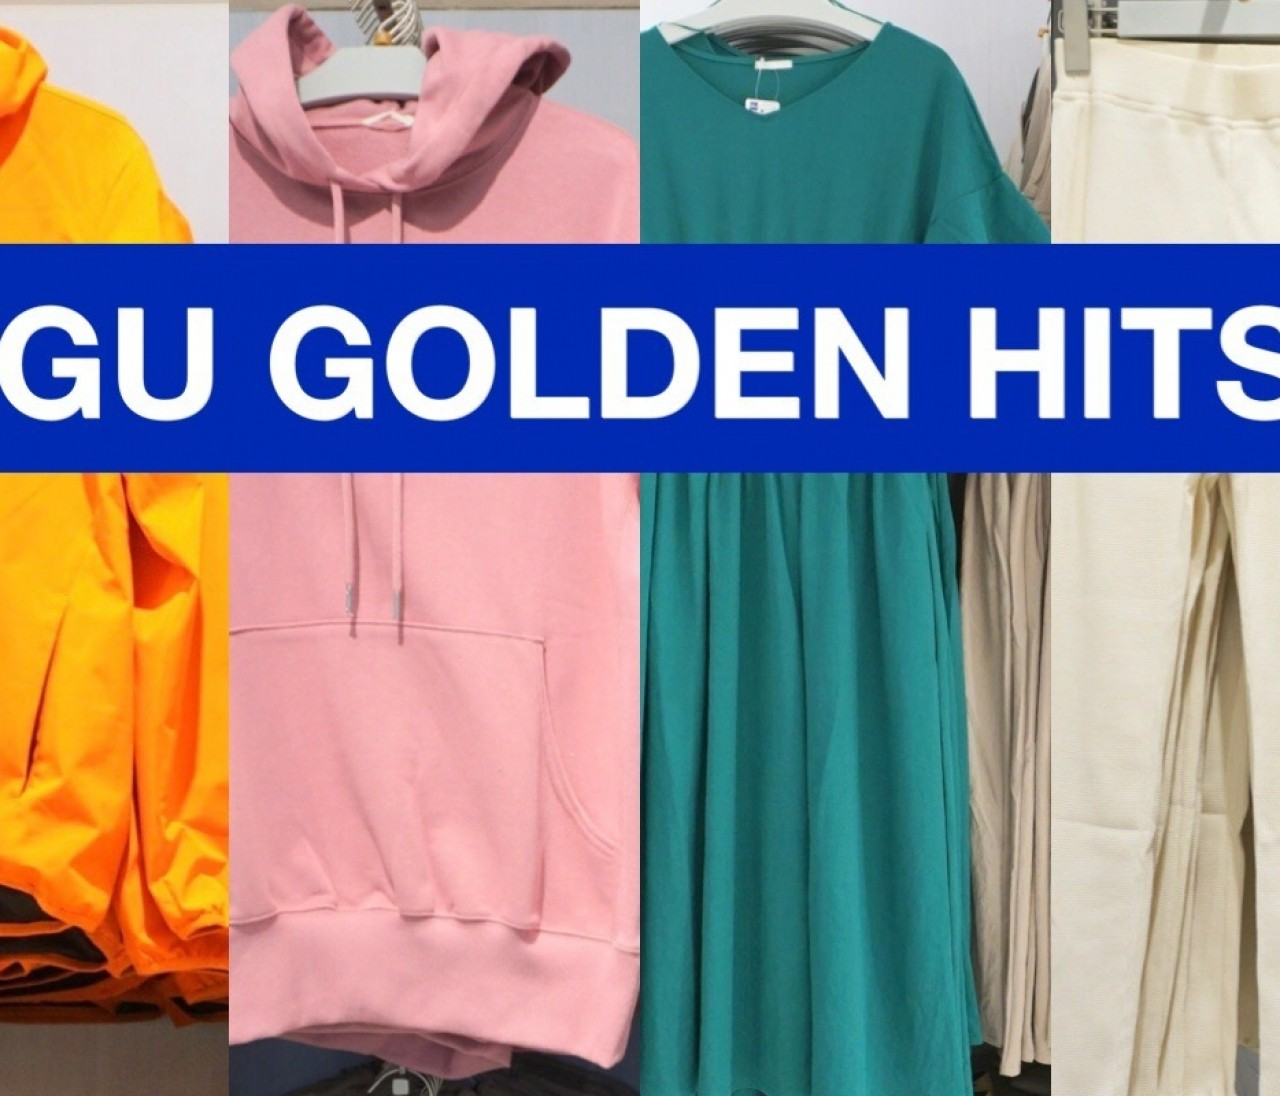 【GU(ジーユー)】30代女子向け大人カジュアル2019春夏新作ヒットパレード13選